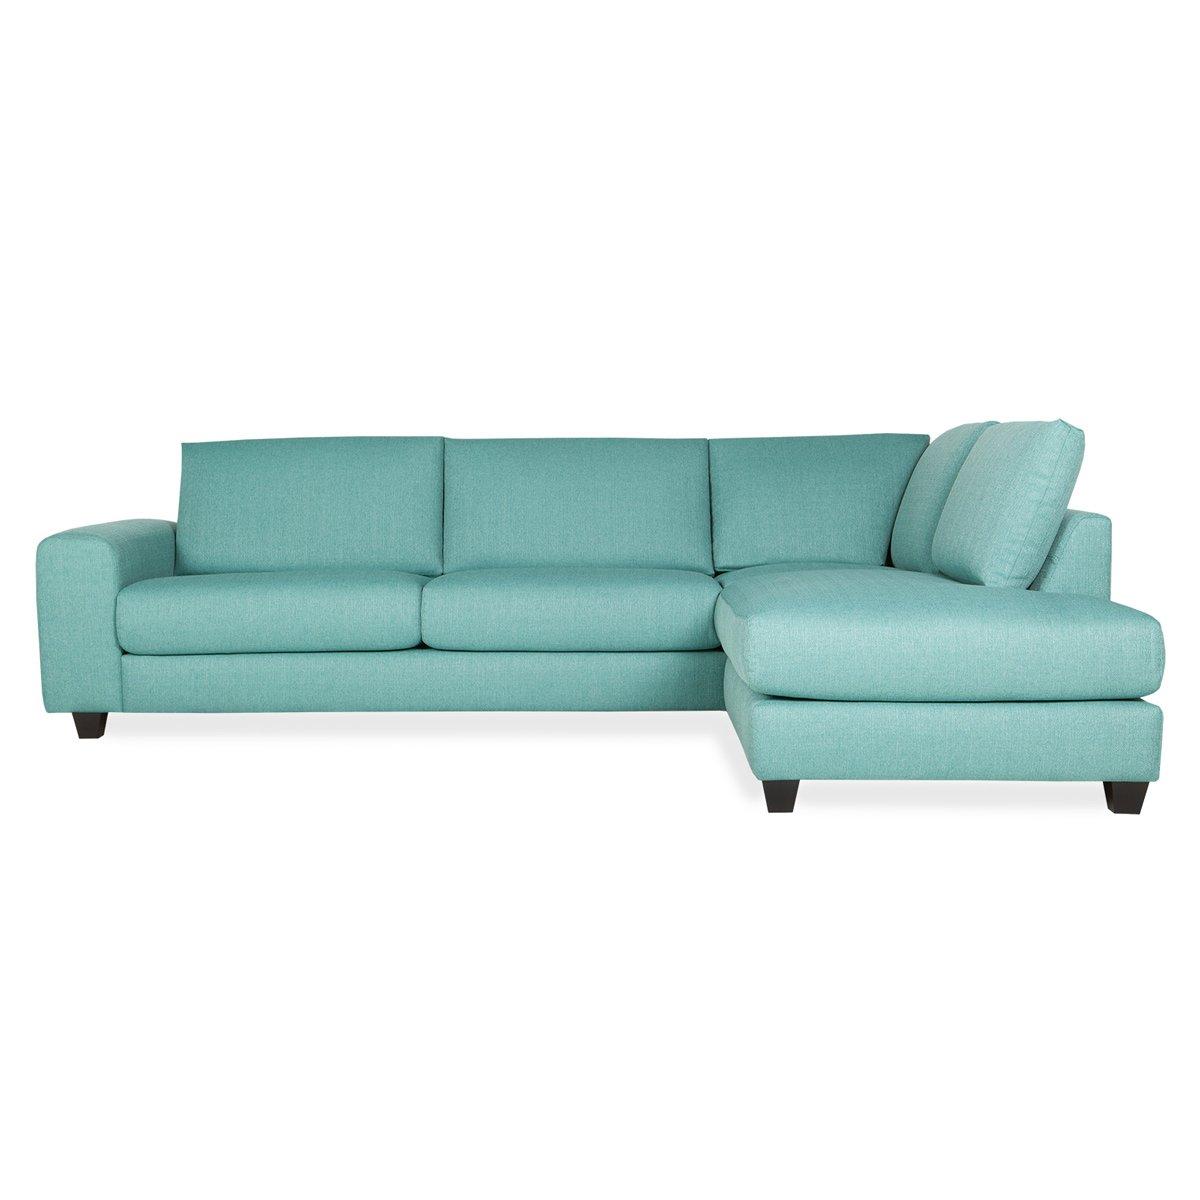 Canap d 39 angle design avignon meubles et atmosph re - Canape d angle original ...